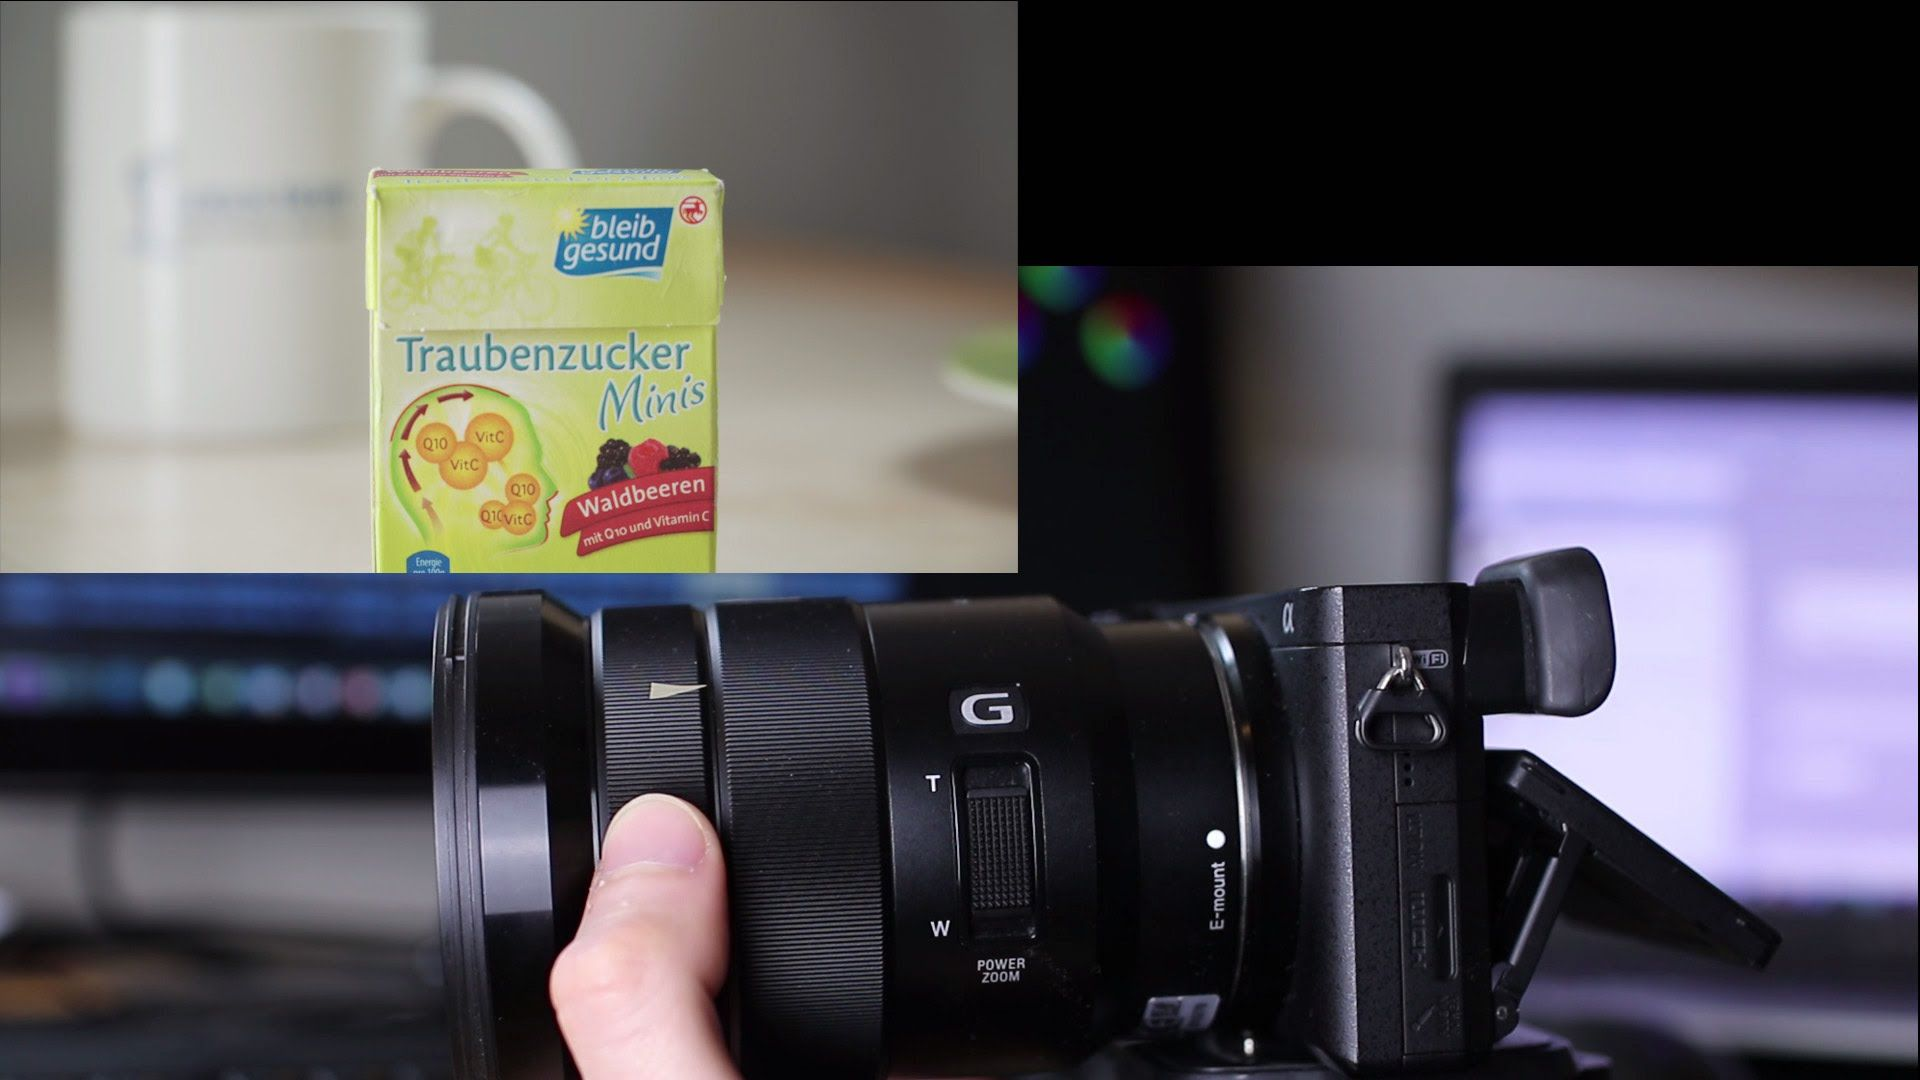 Sony 18 105 F 4 G Oss Review Https Www Camerasdirect Com Au Sony Pz 18 105 Mm F4 G Oss E Mount Lens Sony Lenses Sony Mirrorless Camera